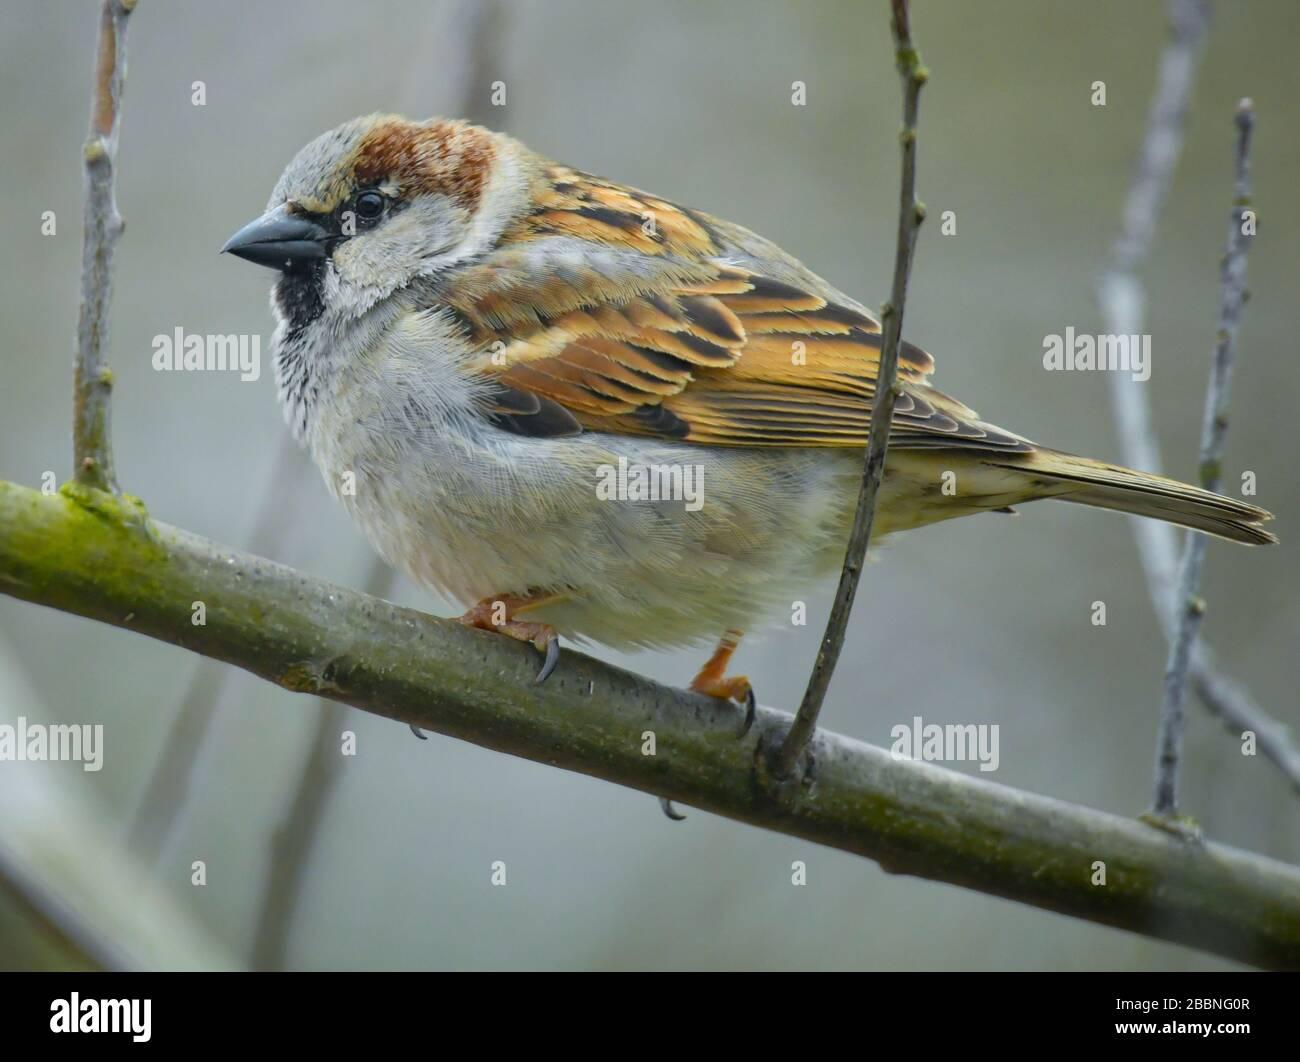 Sieversdorf, Alemania. 30 de marzo de 2020. Un gorrión de la casa (Passer domesticus). Crédito: Patrick Pleul/dpa-Zentralbild/ZB/dpa/Alamy Live News Foto de stock